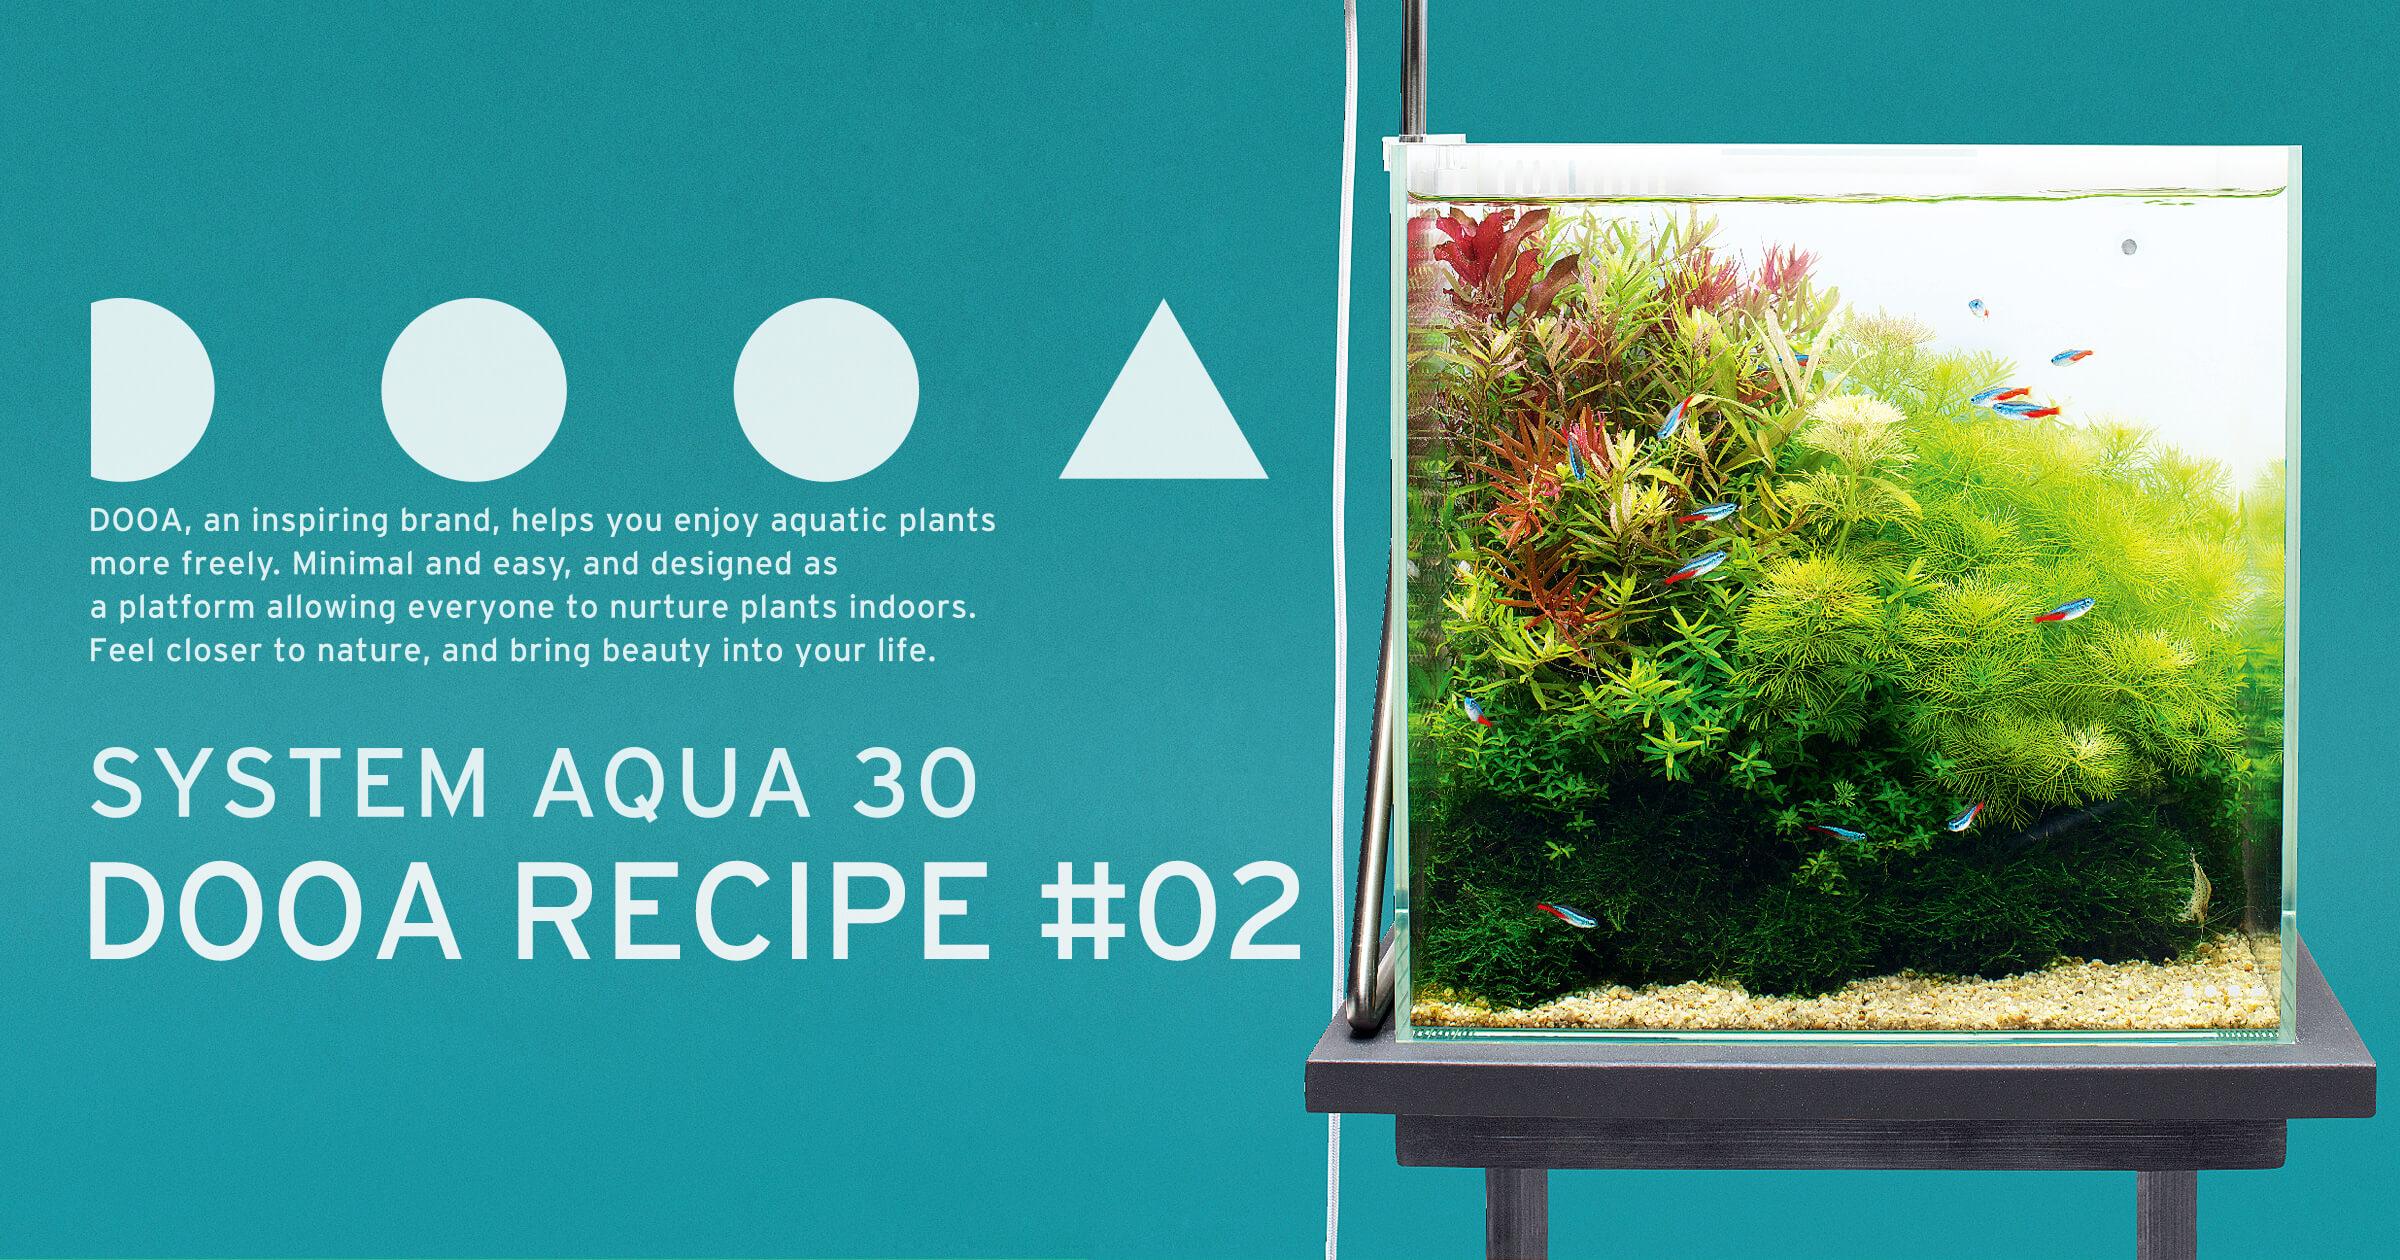 【DOOAレシピ】#02「水草の安らぎと癒し」